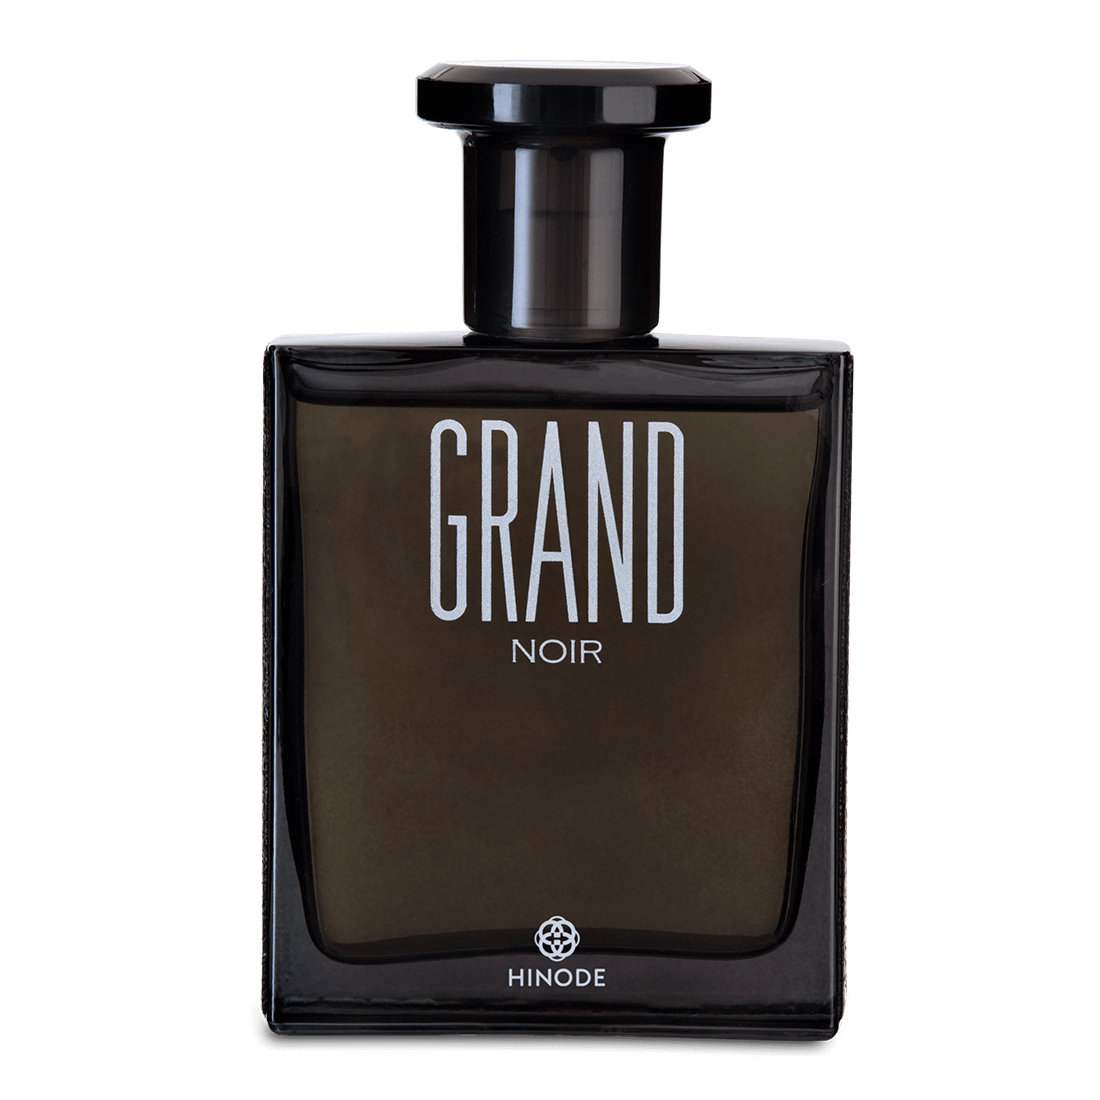 GRAND NOIR